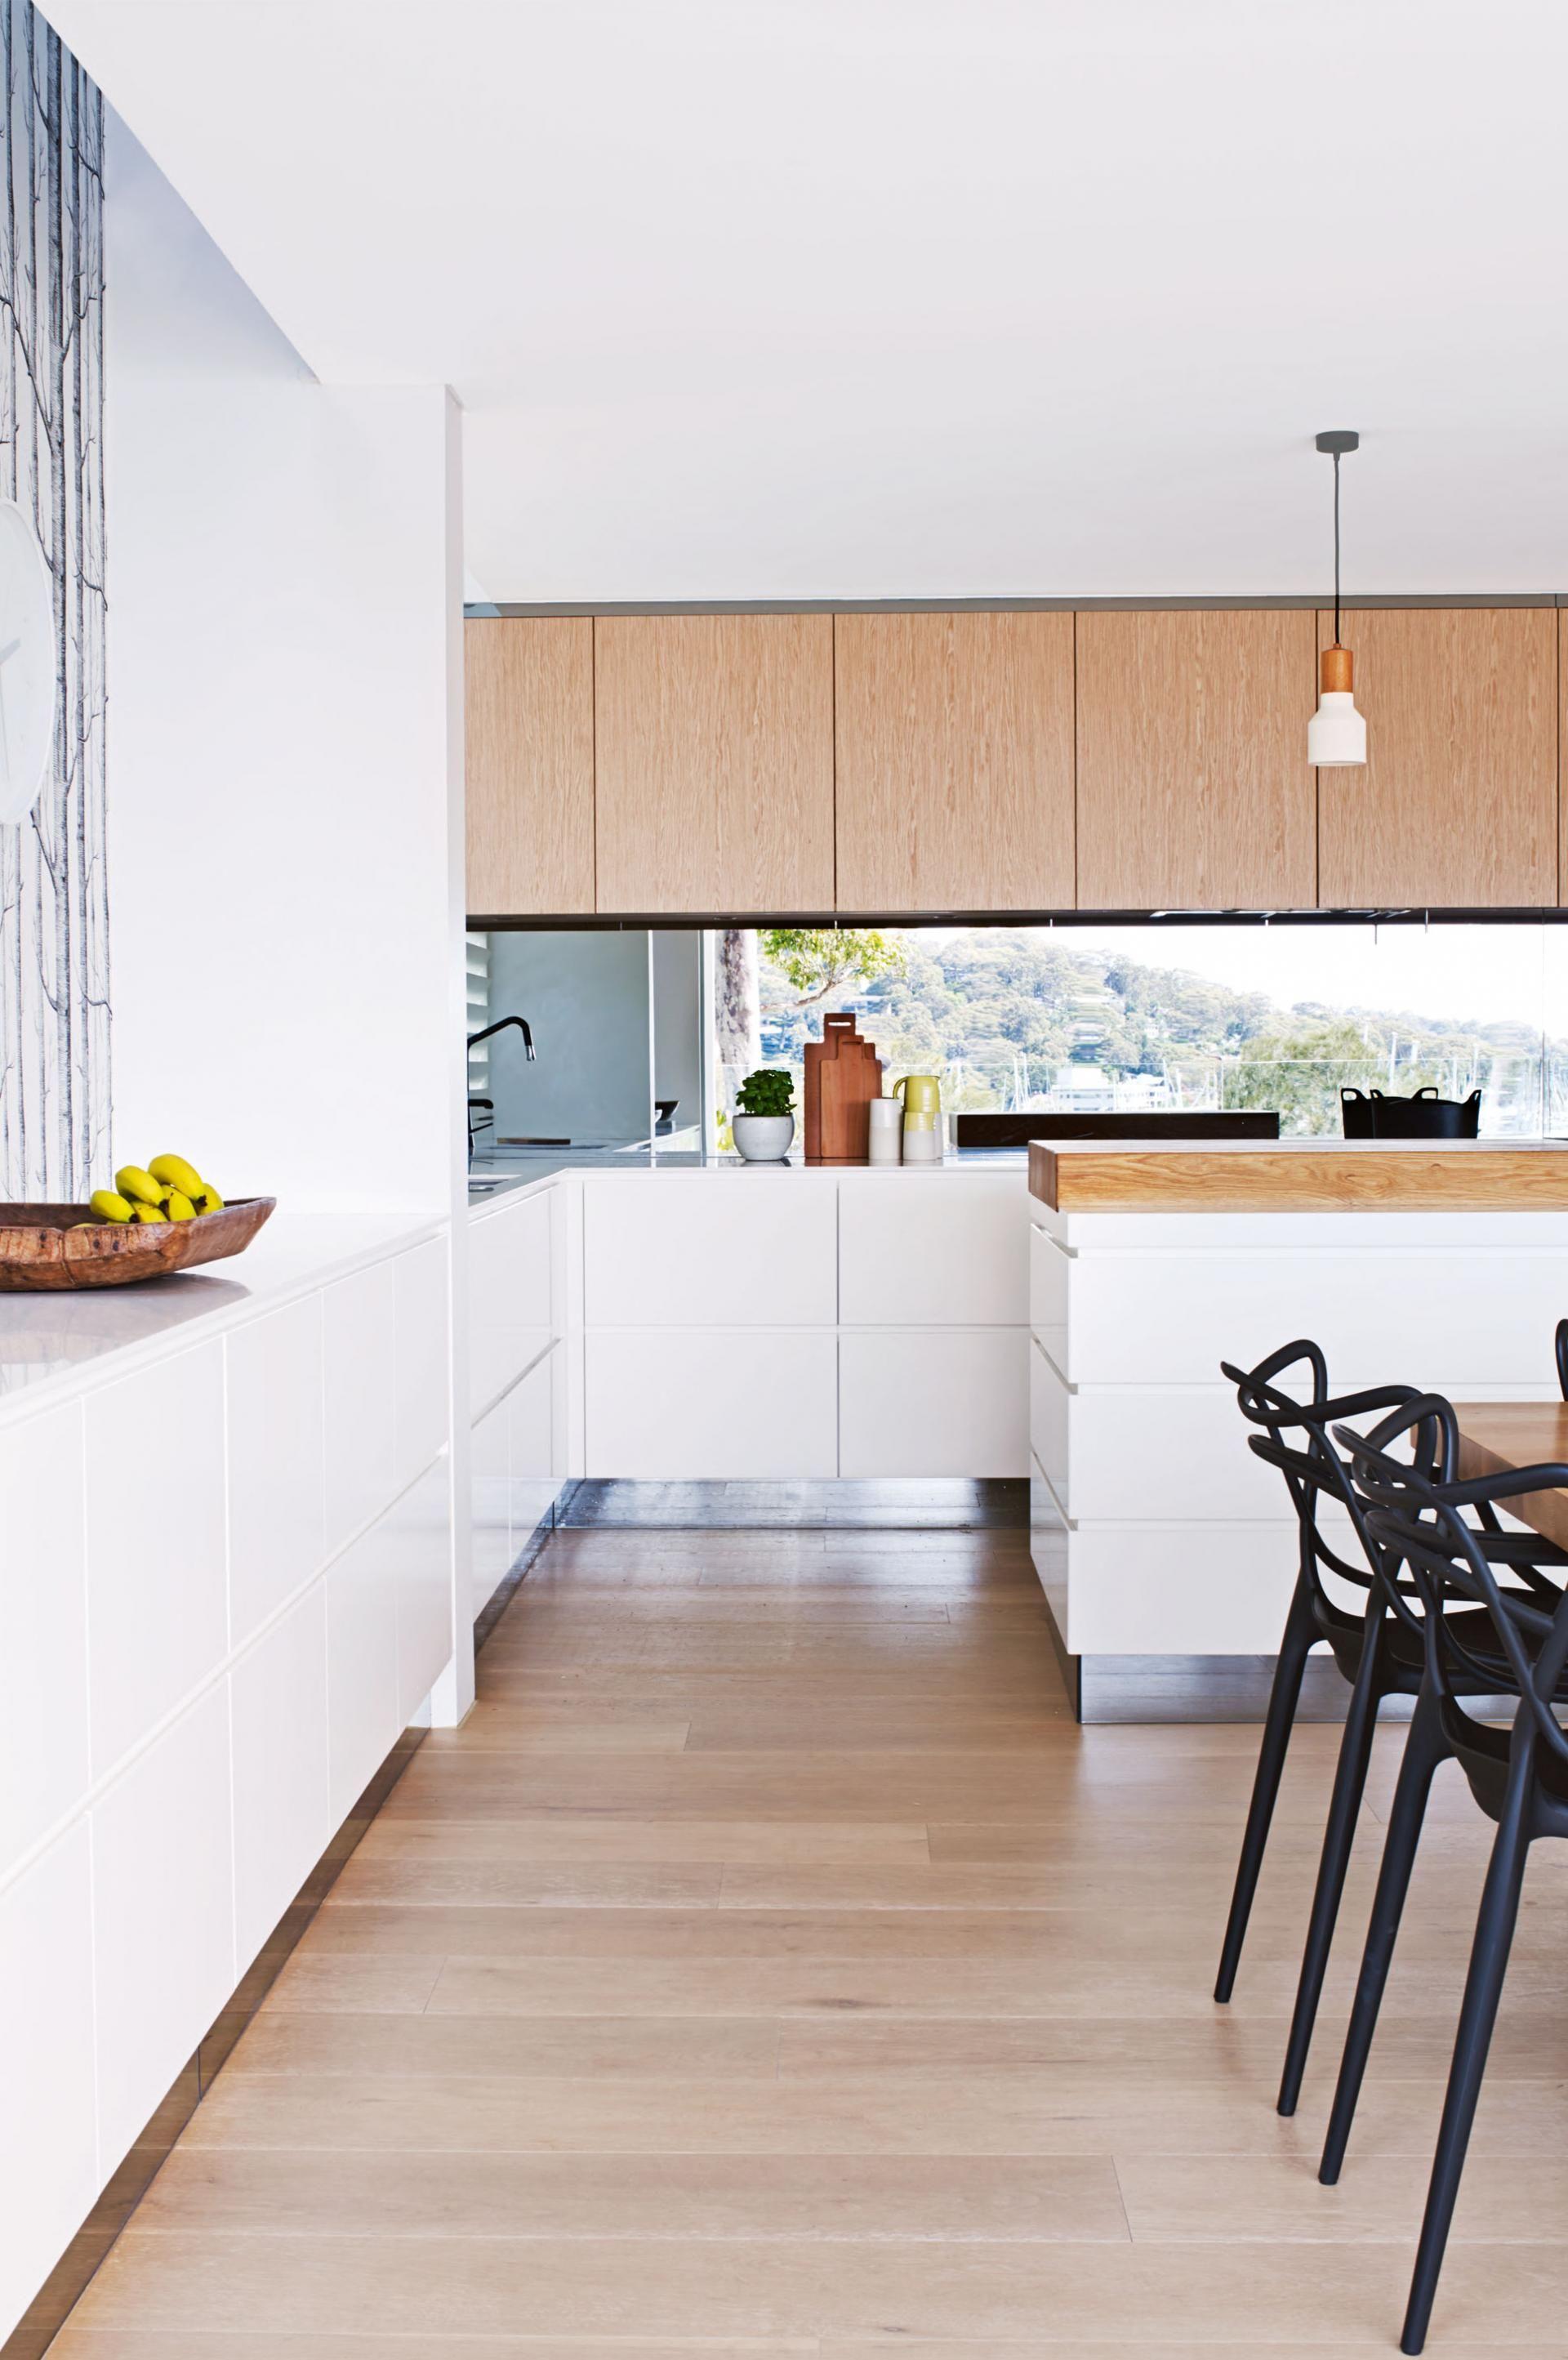 White Kitchenfloorboardstimbercupboardswhitecabinetryblack - Breakfast nook wooden cabinets linear kitchen mixer tap yellow chairs